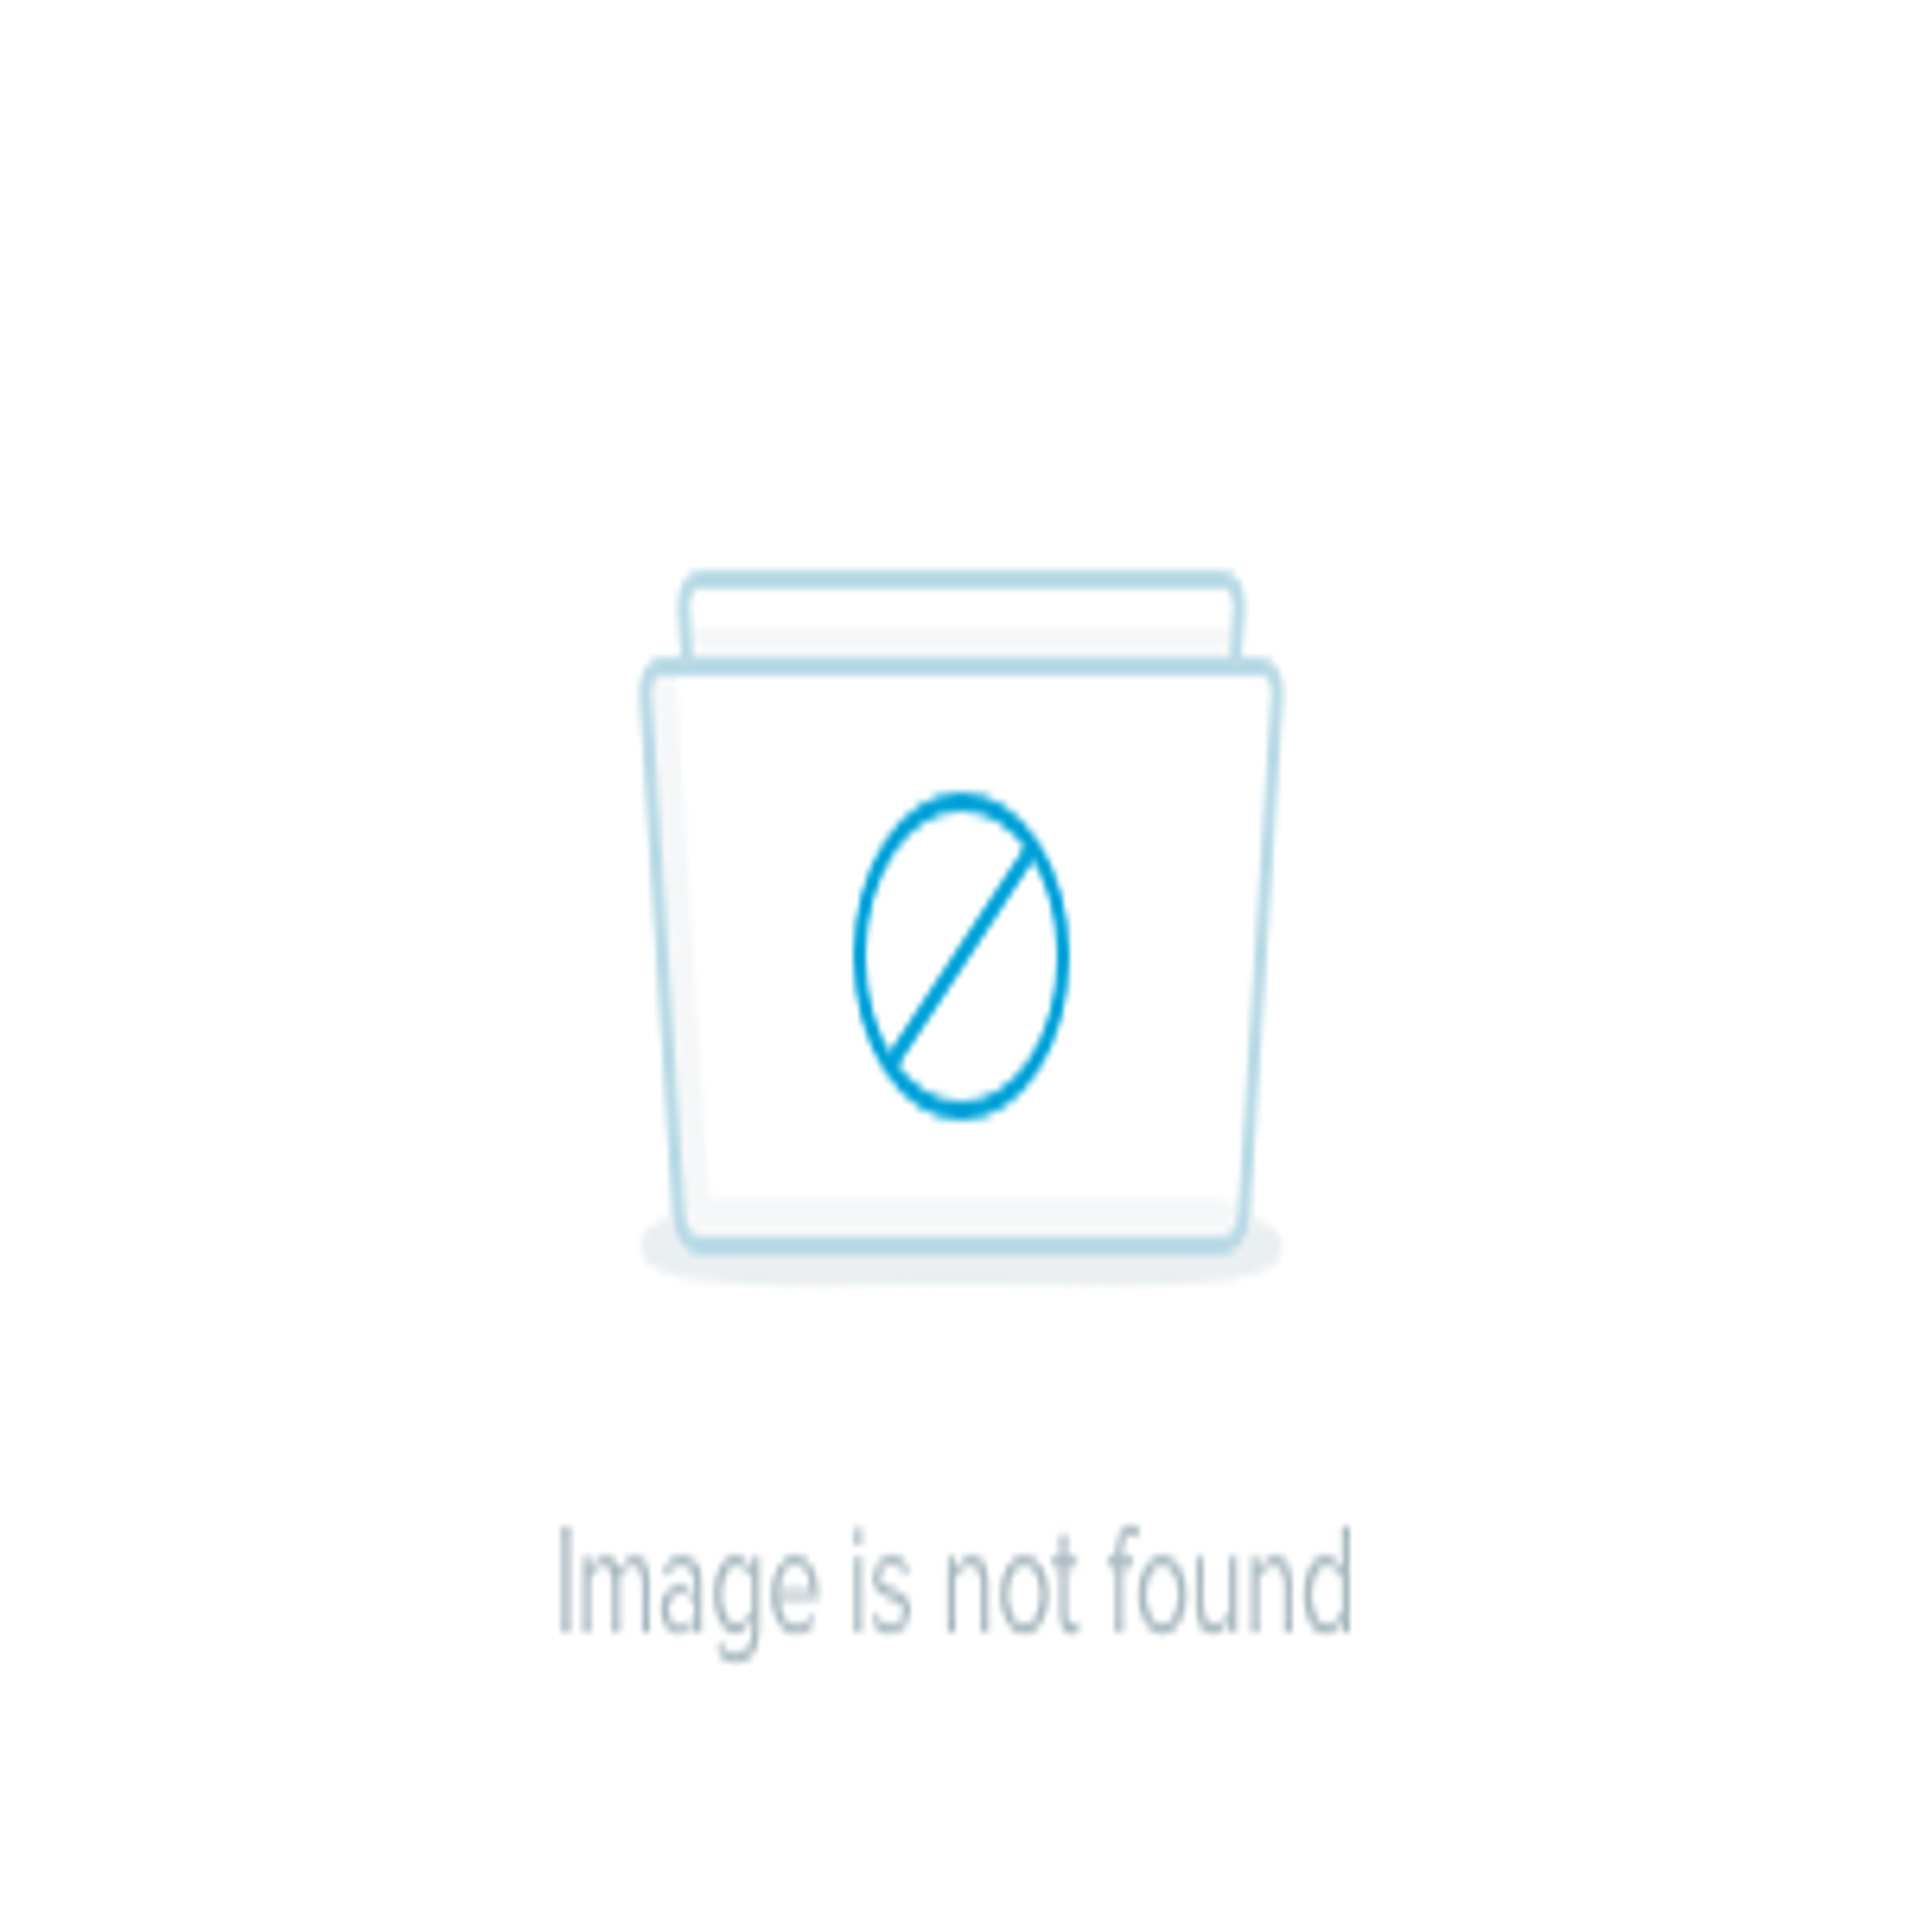 генетика украинцев